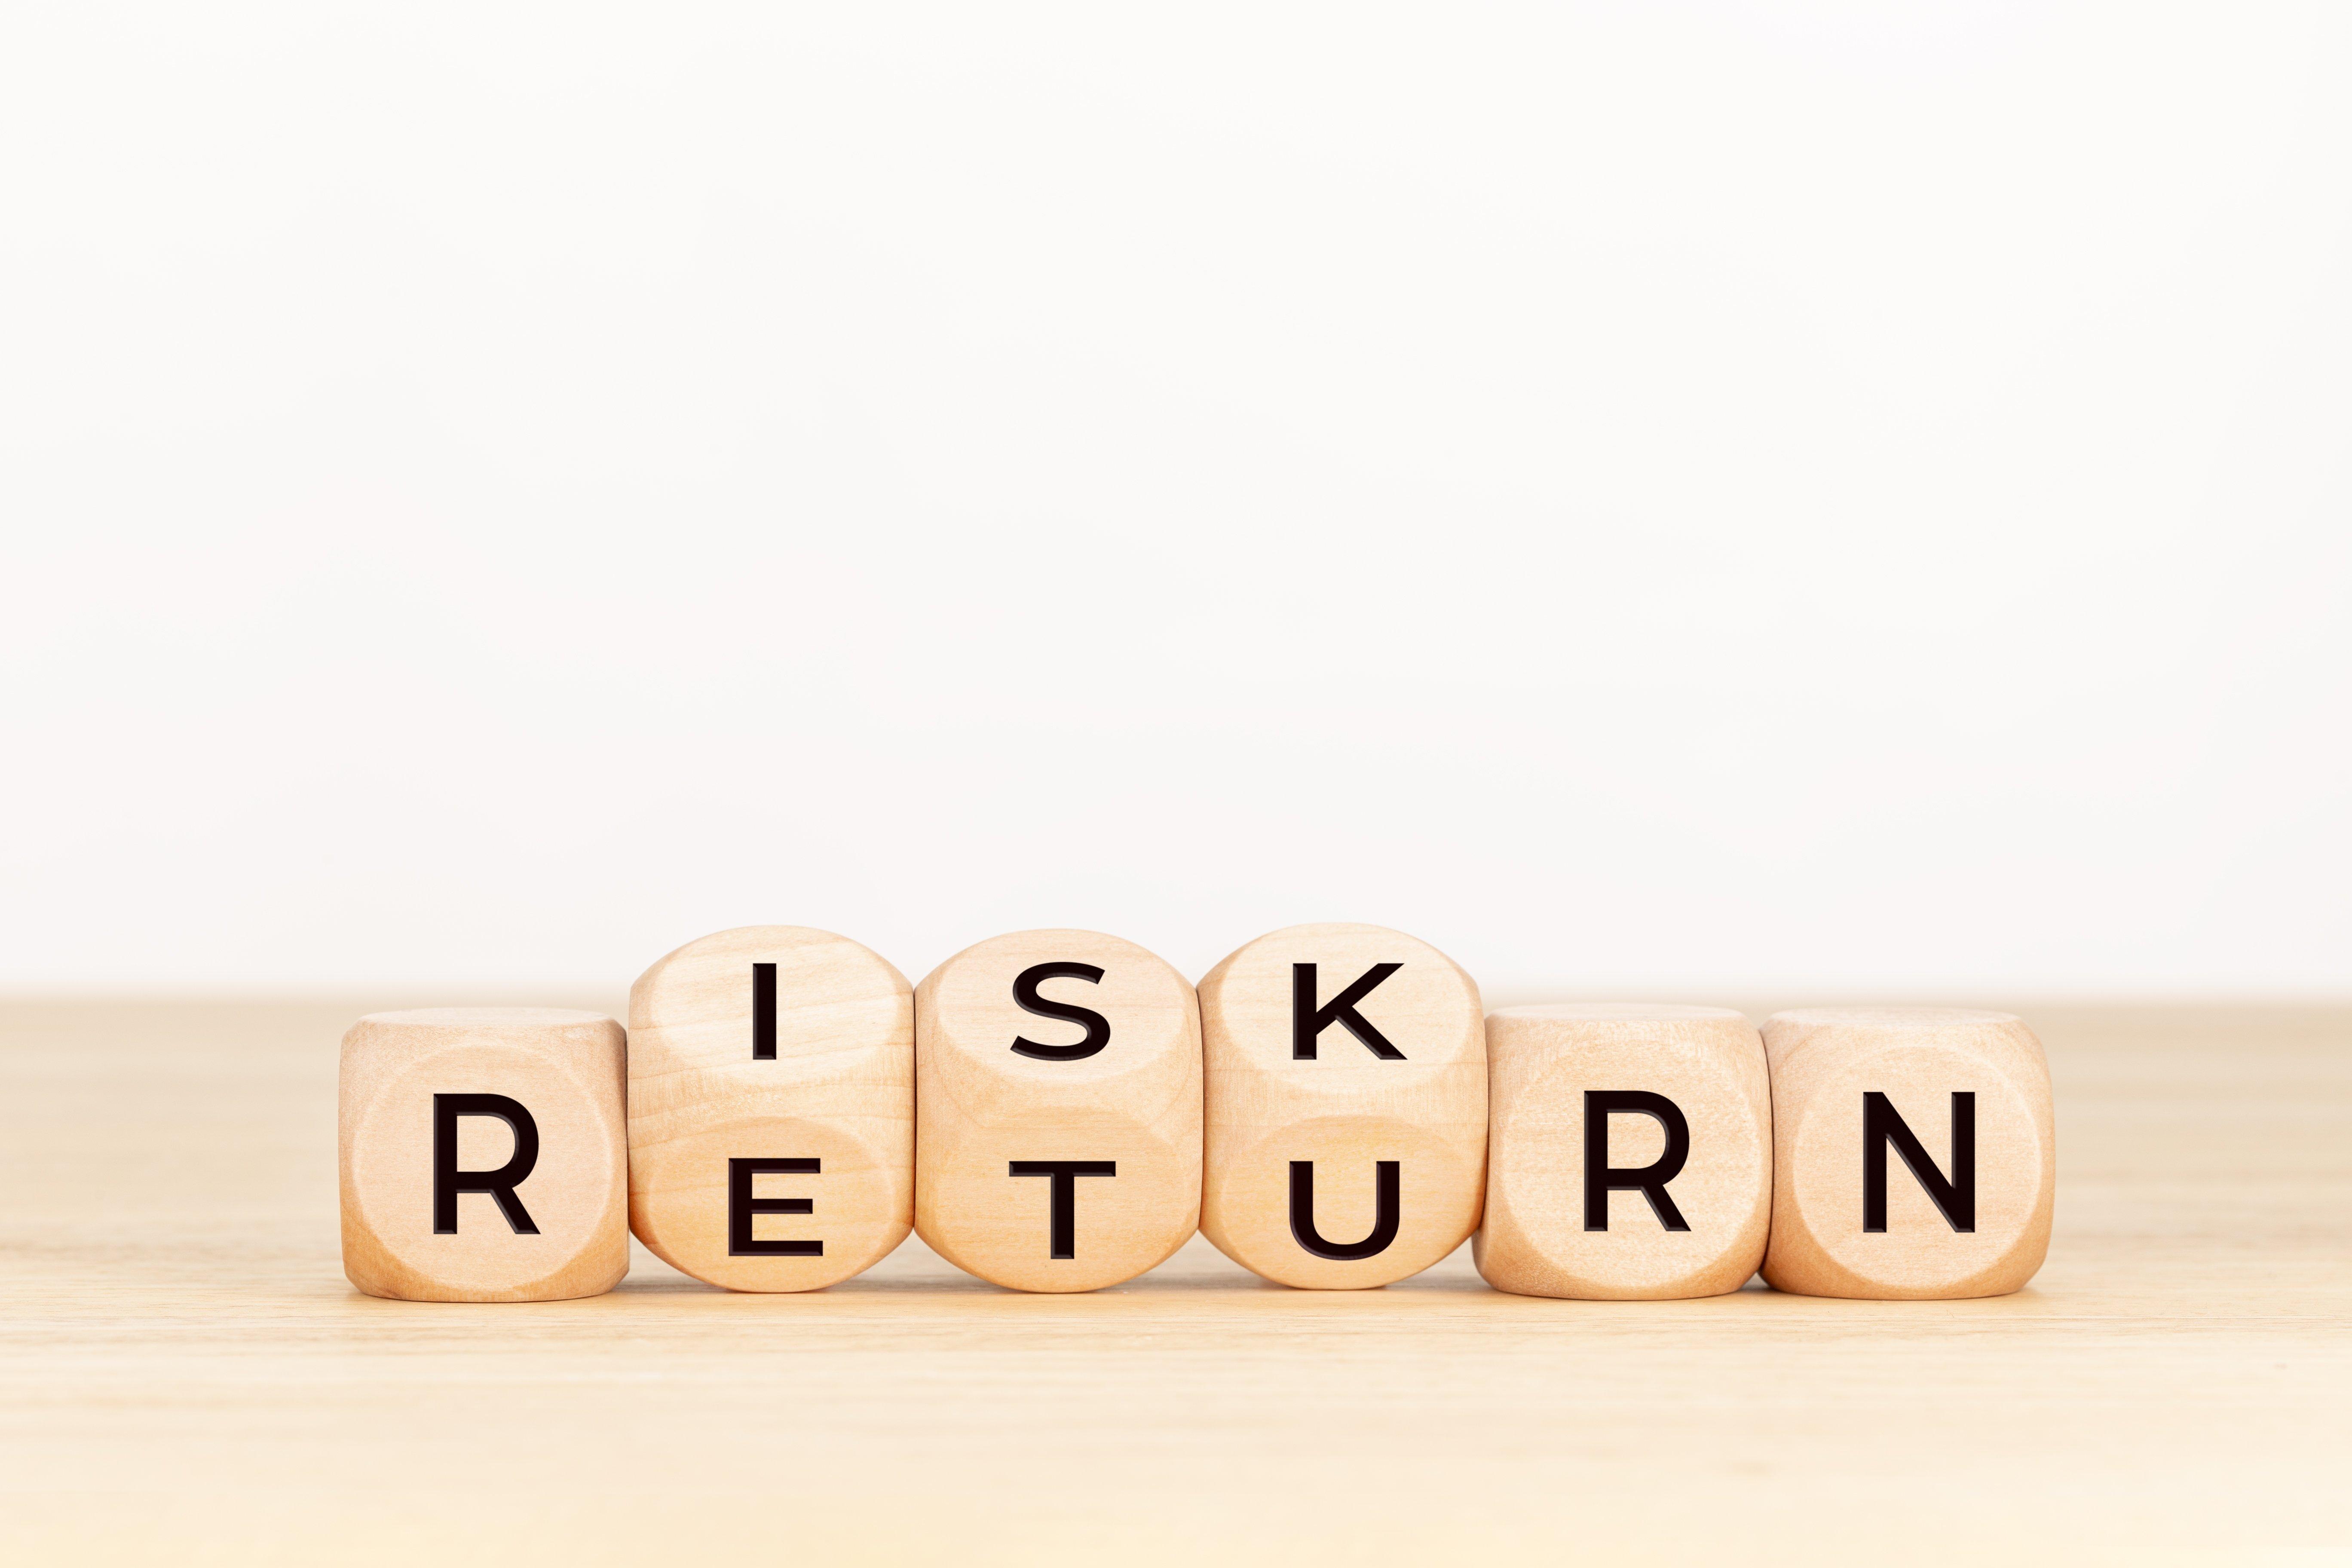 risk-return-concept-2ZUR2Z3